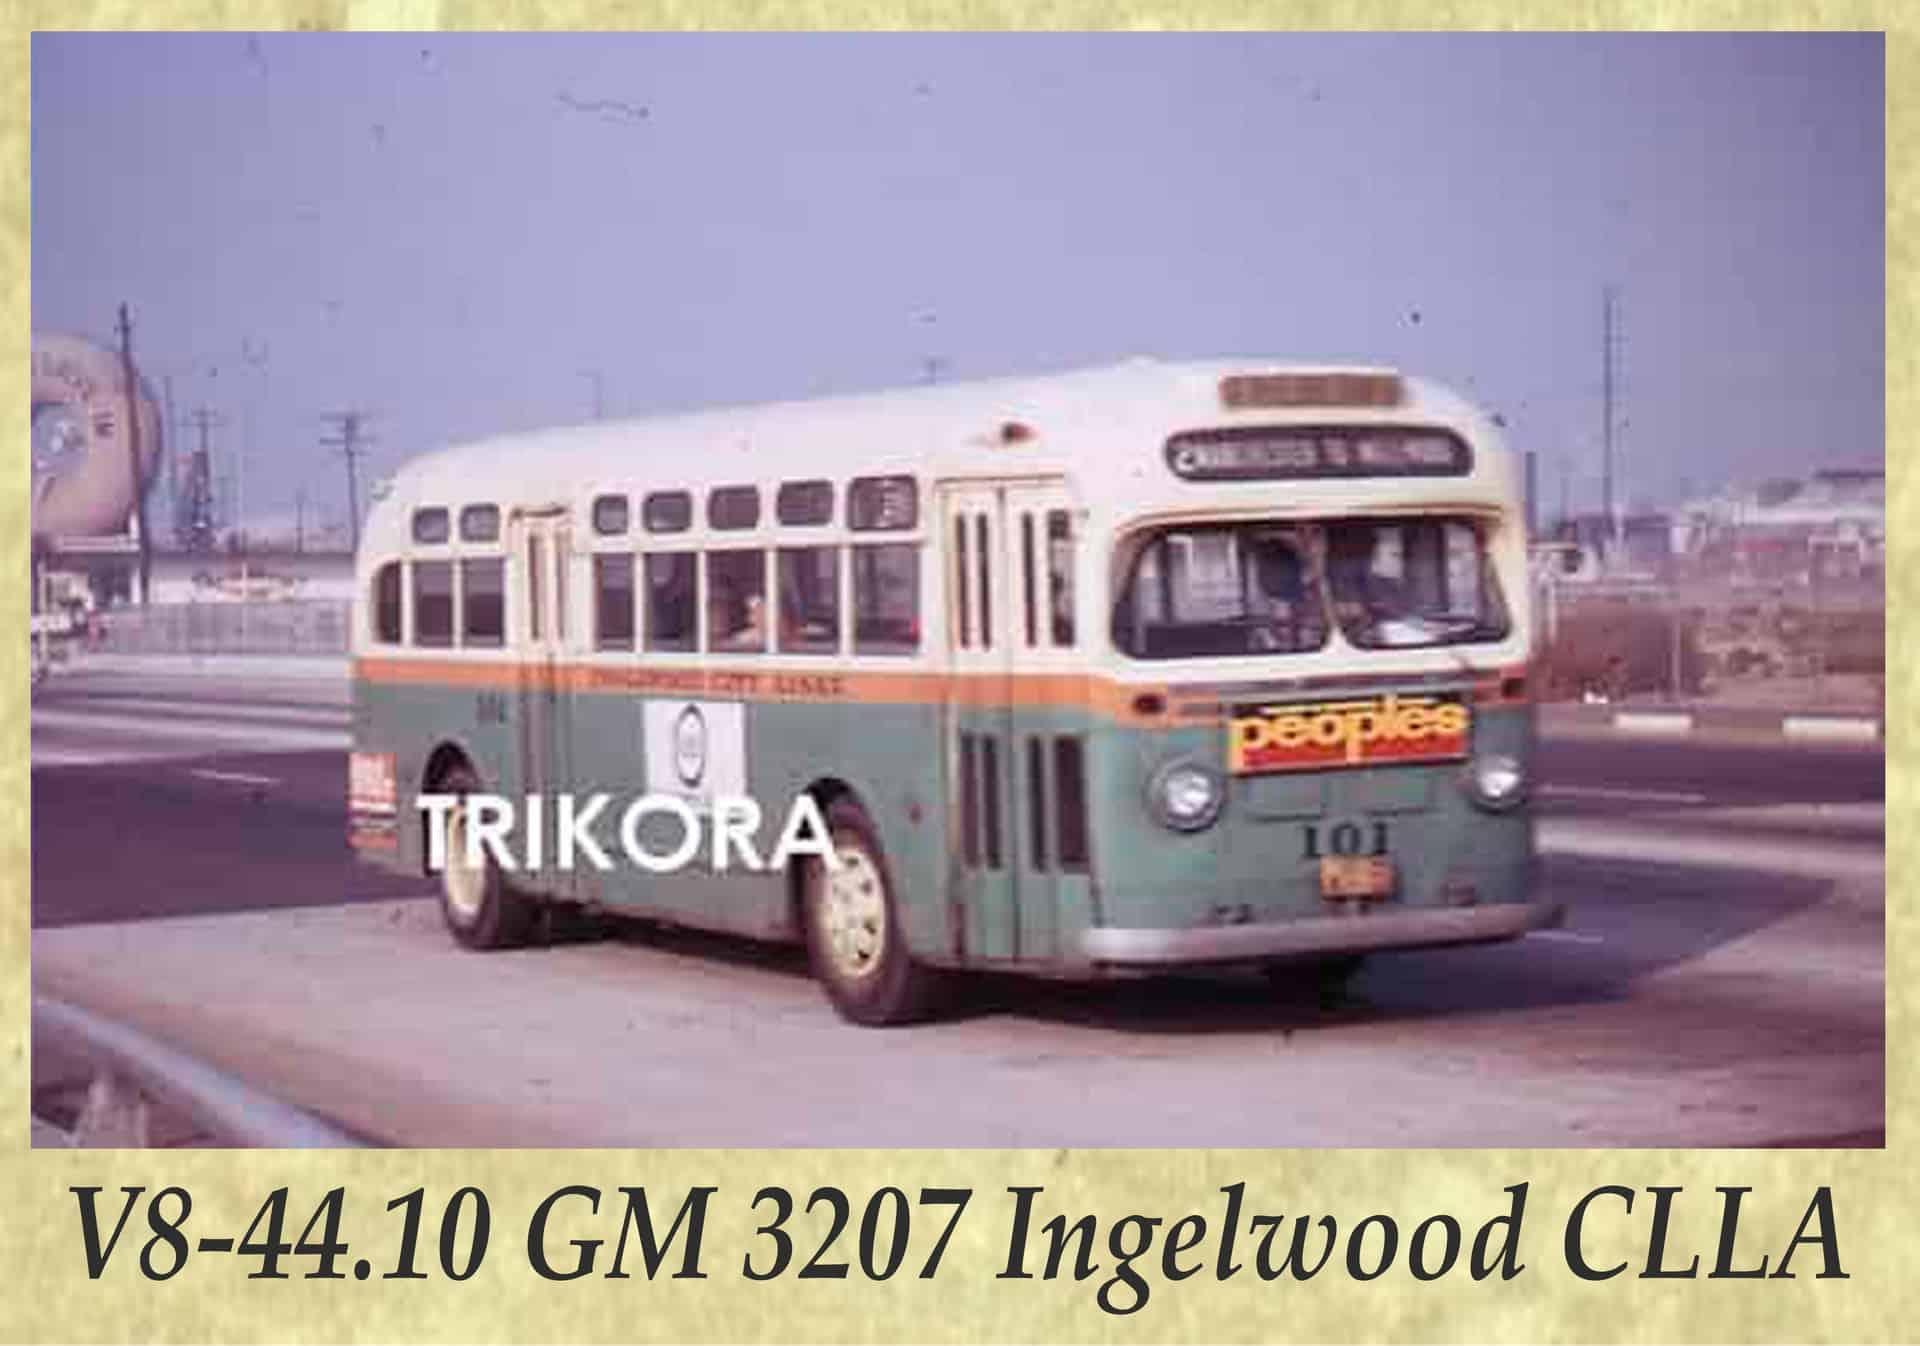 V8-44.10 GM 3207 Ingelwood CLLA